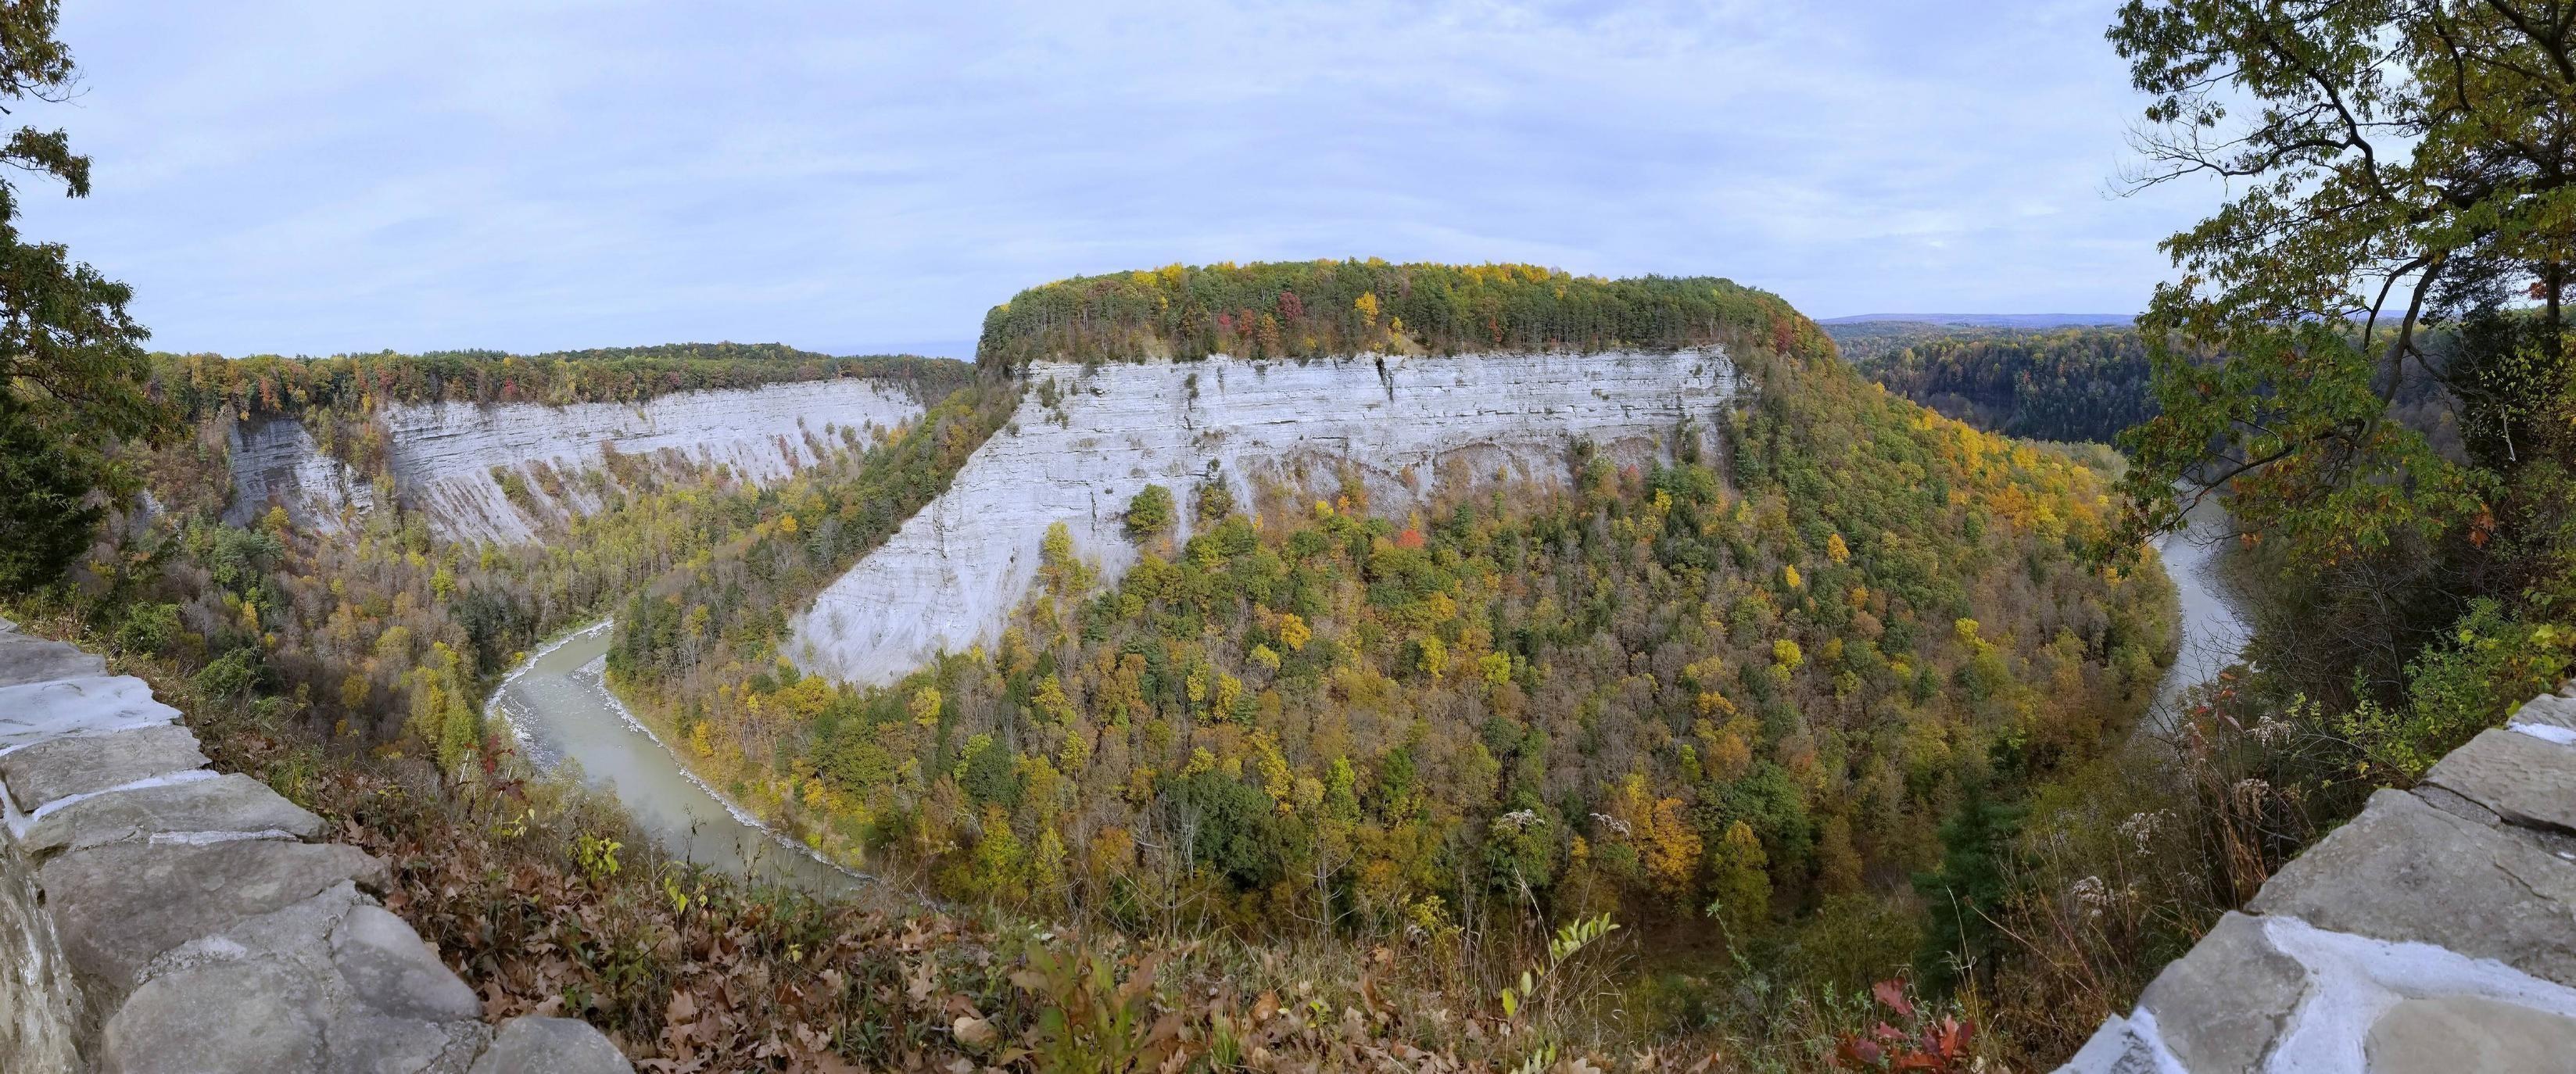 Letchworth State Park NY [OC](5492 x 2290) #letchworthstatepark Letchworth State Park NY [OC](5492 x 2290) #letchworthstatepark Letchworth State Park NY [OC](5492 x 2290) #letchworthstatepark Letchworth State Park NY [OC](5492 x 2290) #letchworthstatepark Letchworth State Park NY [OC](5492 x 2290) #letchworthstatepark Letchworth State Park NY [OC](5492 x 2290) #letchworthstatepark Letchworth State Park NY [OC](5492 x 2290) #letchworthstatepark Letchworth State Park NY [OC](5492 x 2290) #letchwor #letchworthstatepark